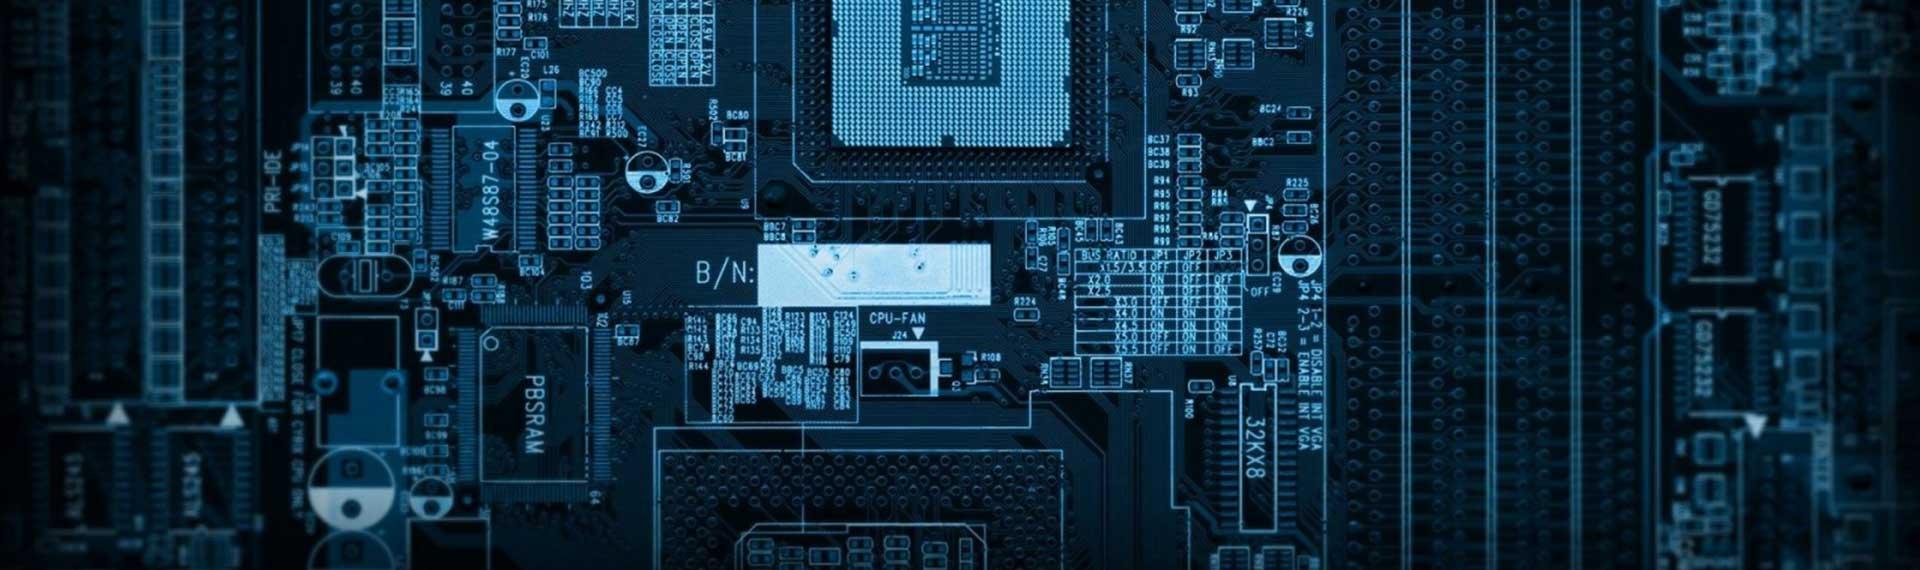 Tips Cerdas Merawat Motherboard Laptop